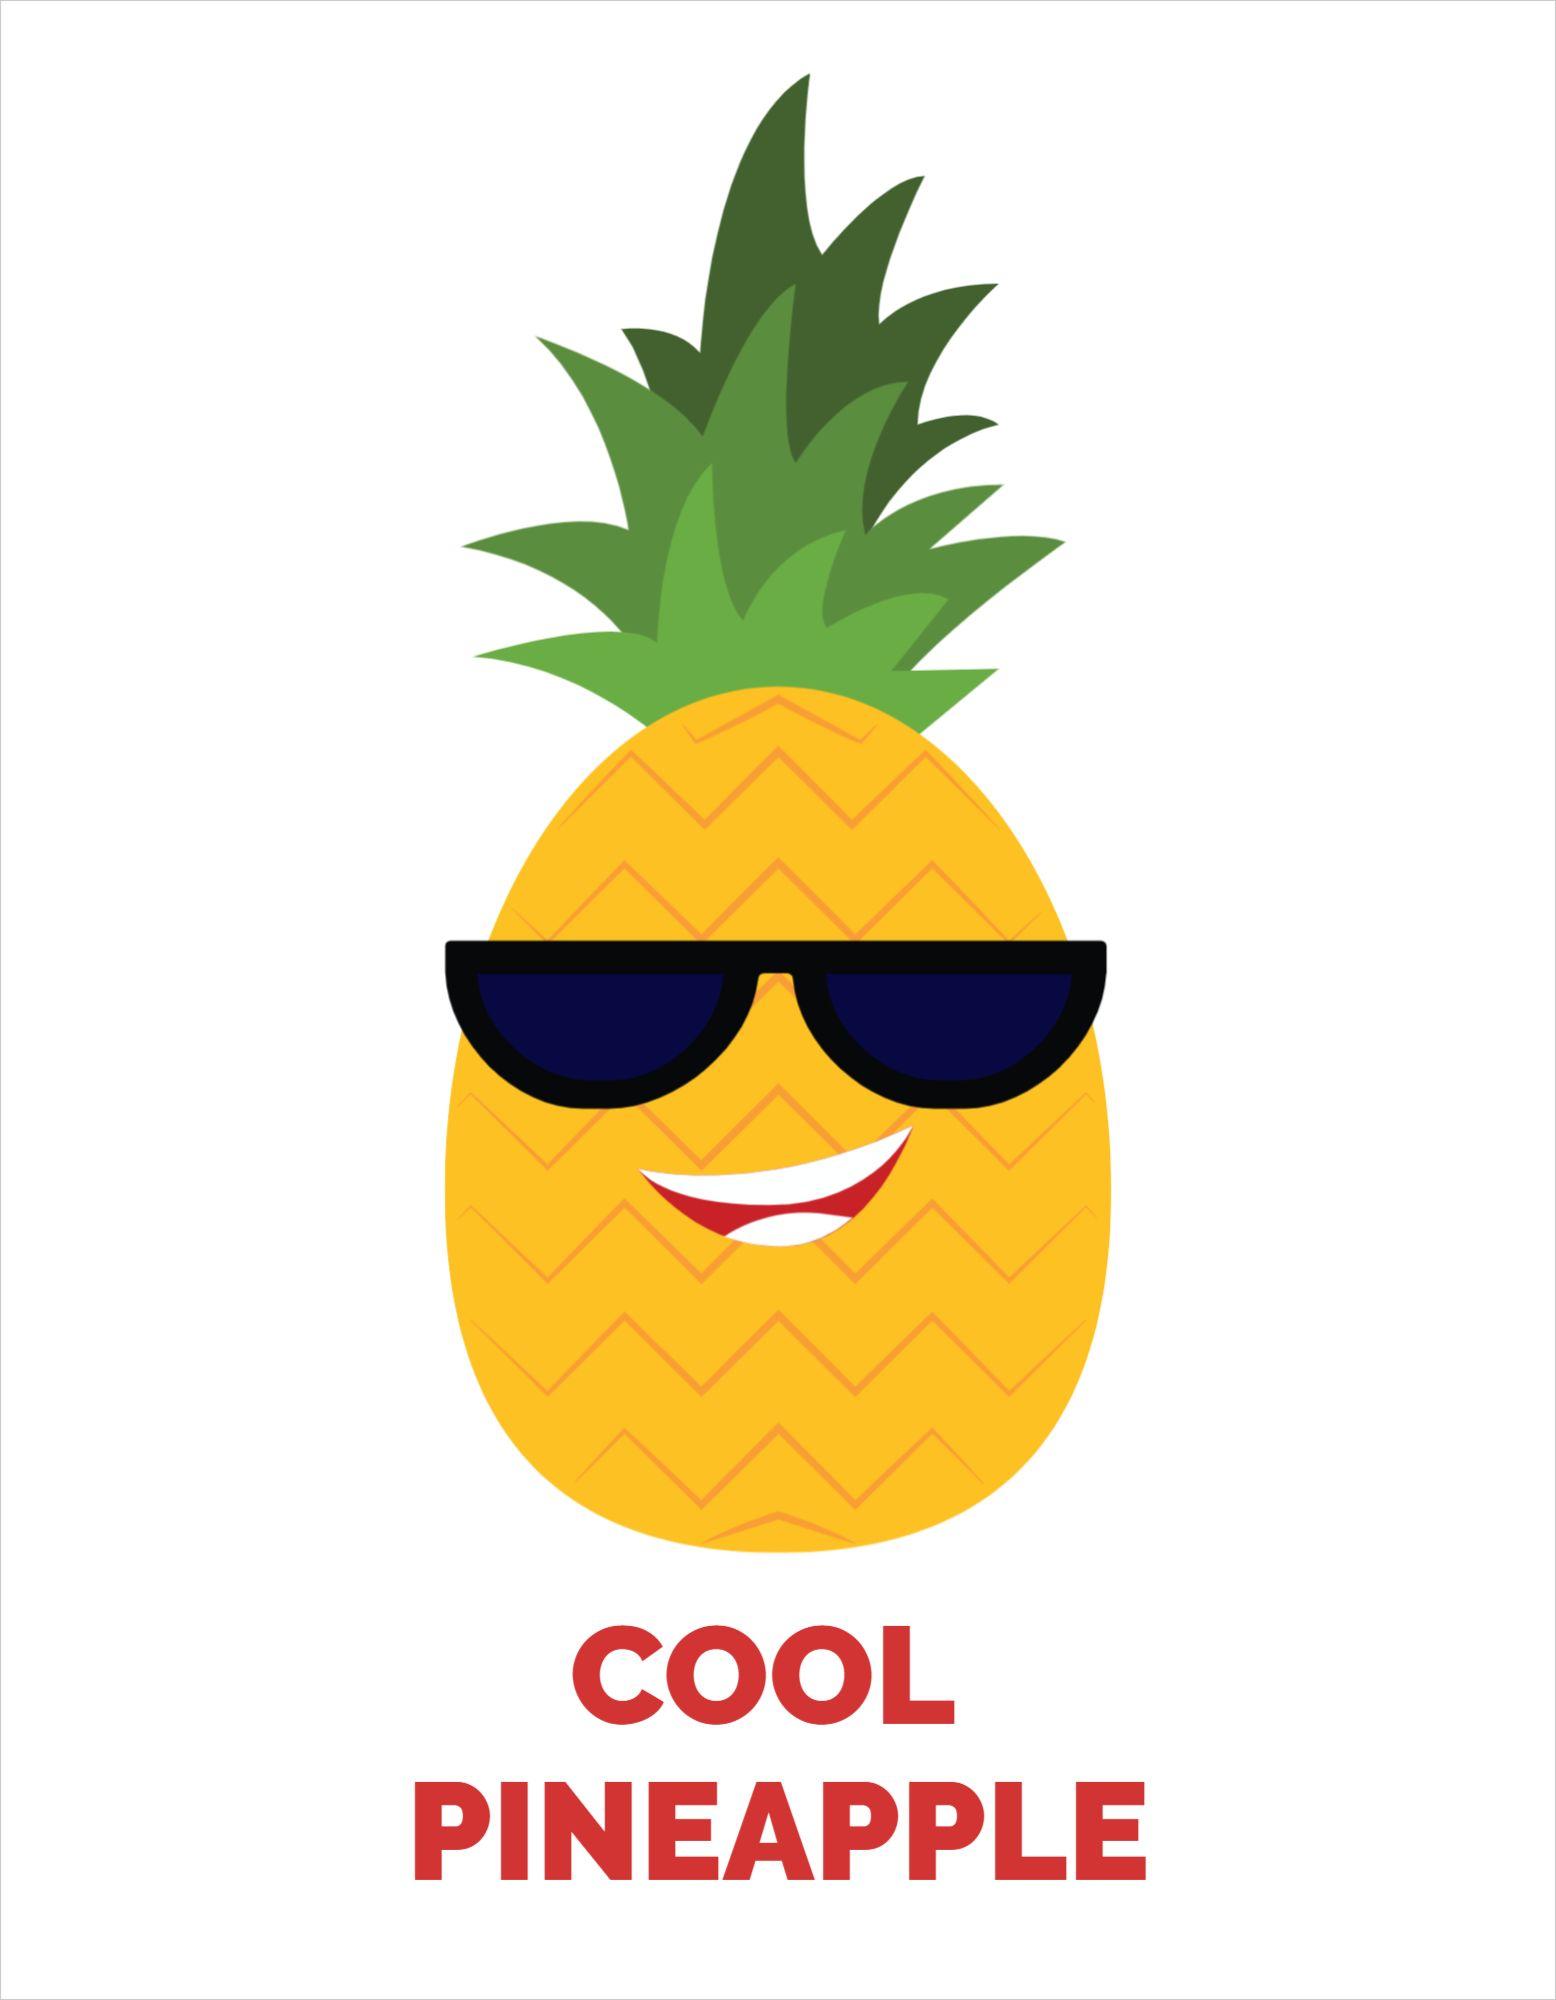 Pineapple Image T-shirt Template